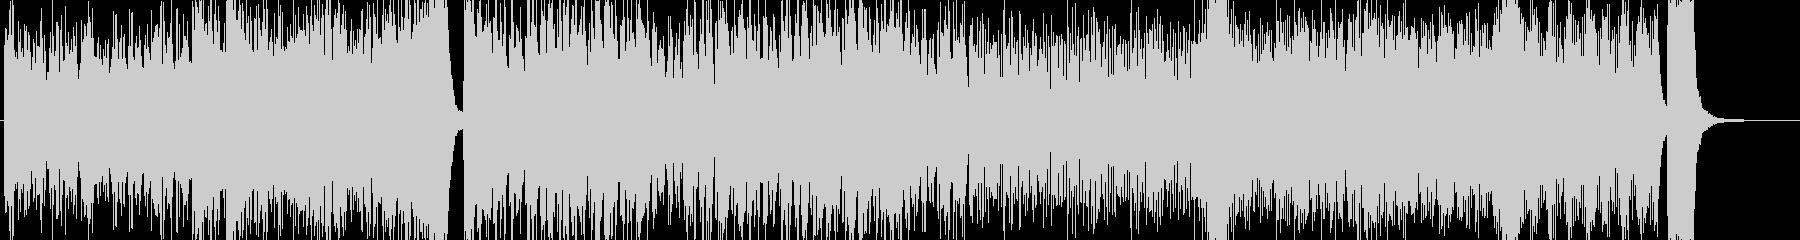 B)WAVE 16bit 44.1khzの未再生の波形